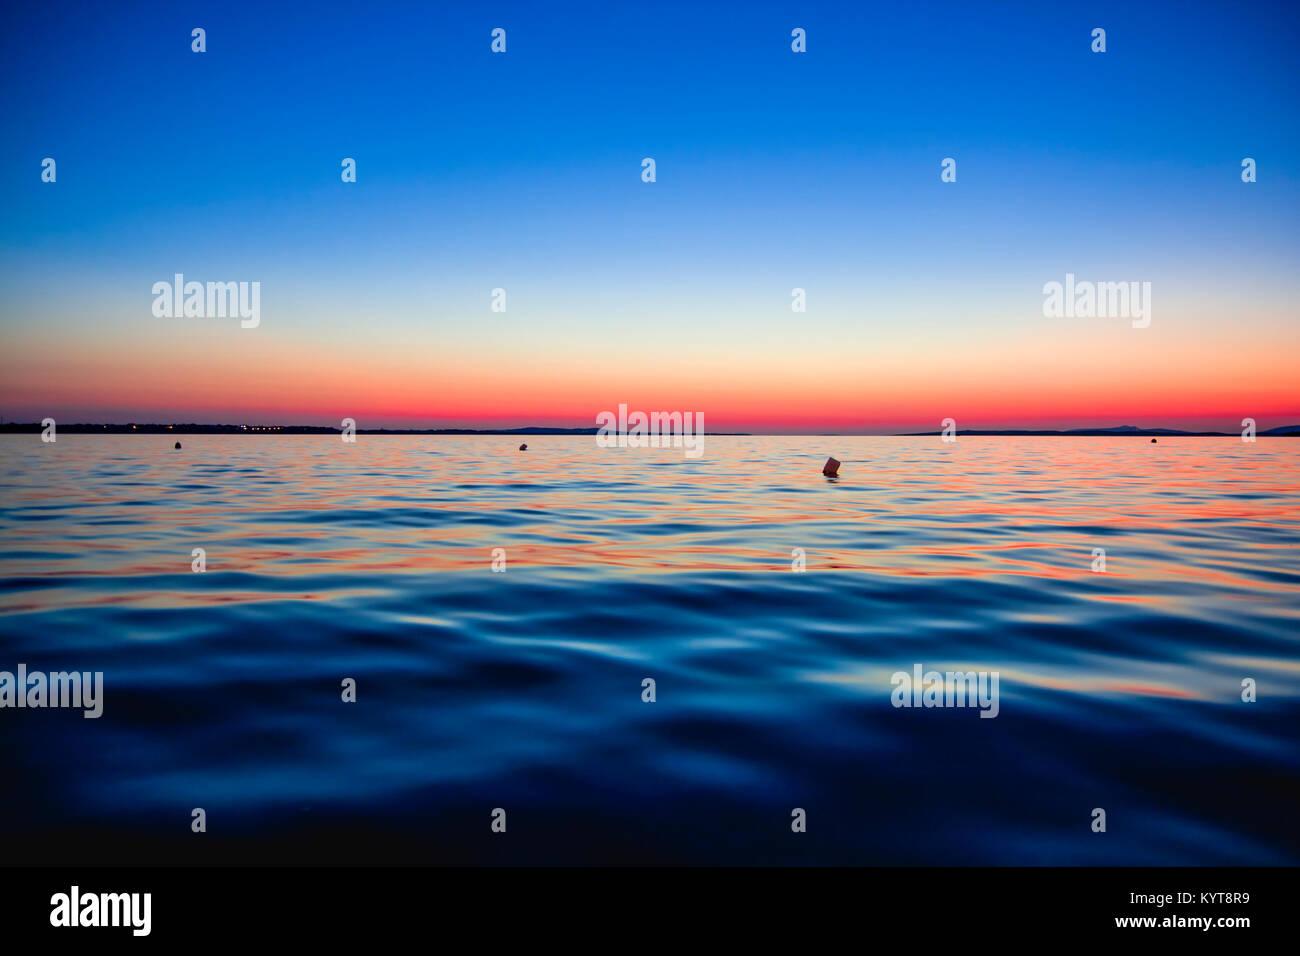 Blue hour at adriatic sea in Croatia Stock Photo